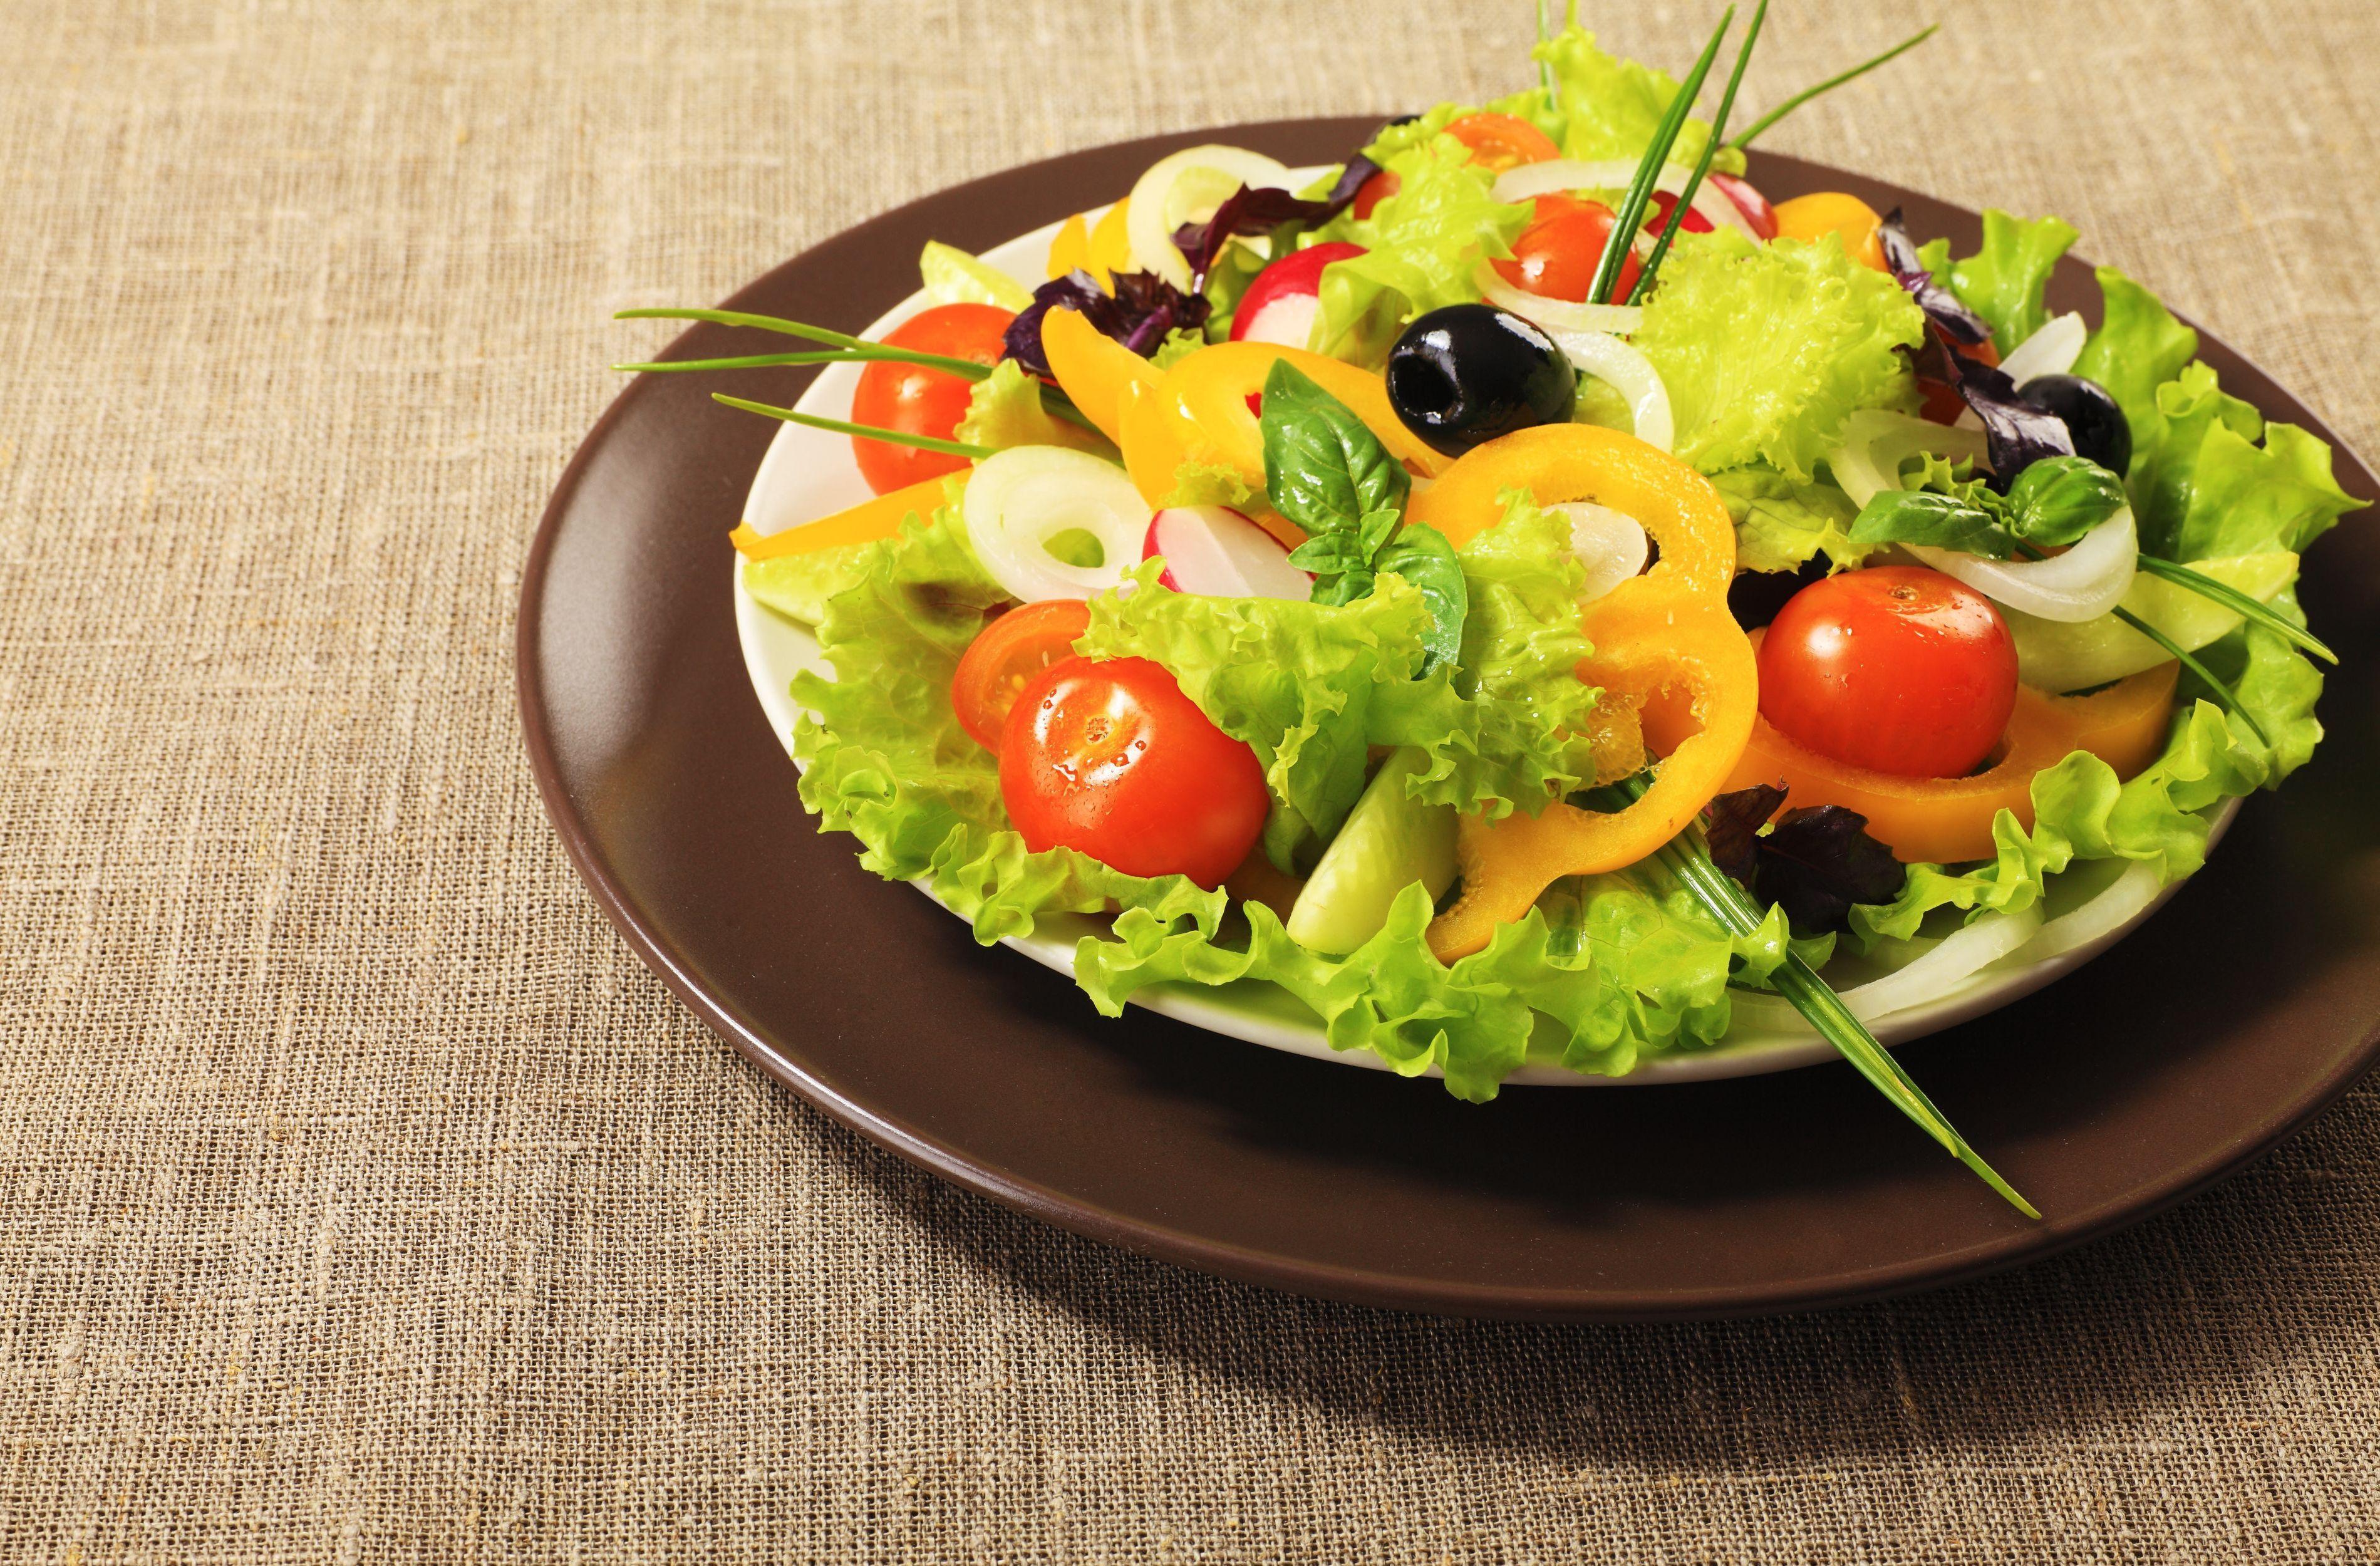 еда курица рис помидоры салат бесплатно